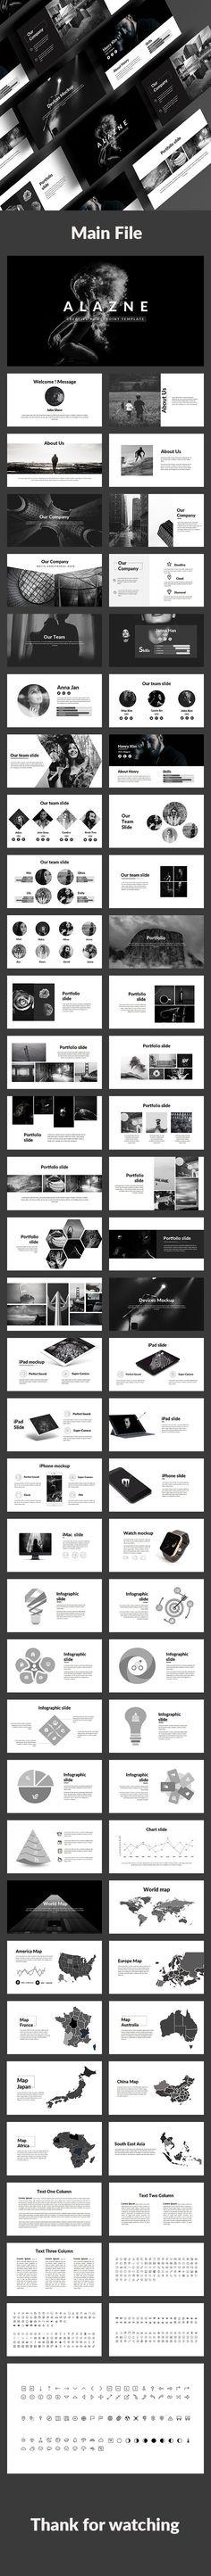 Alazne-Creative Powerpoint Template - Creative #PowerPoint Templates